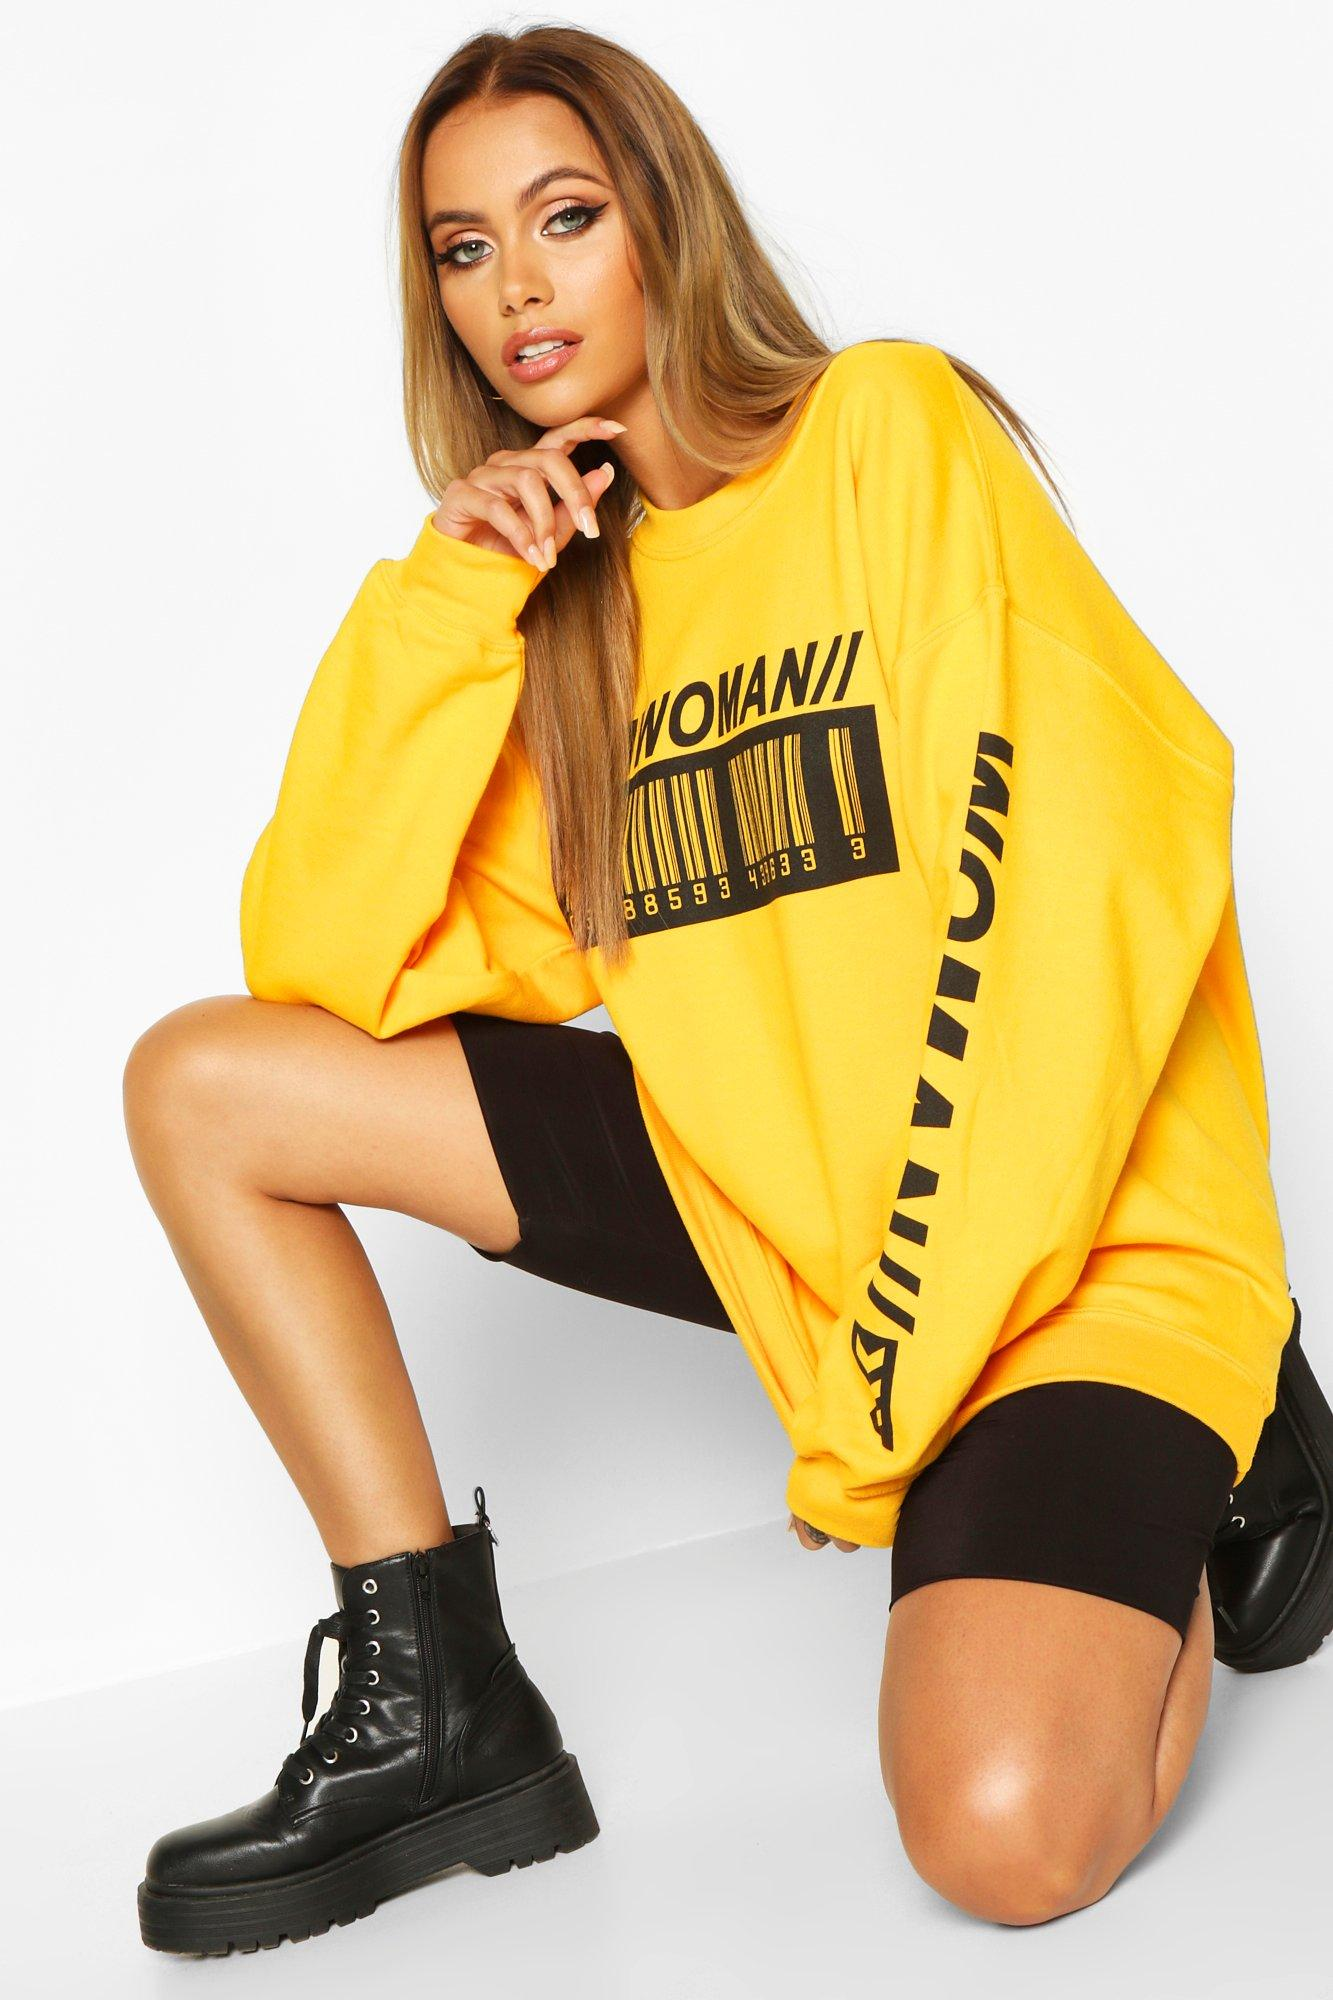 Womens Sweatshirt mit Woman Barcodes-Print - gelb - S, Gelb - Boohoo.com